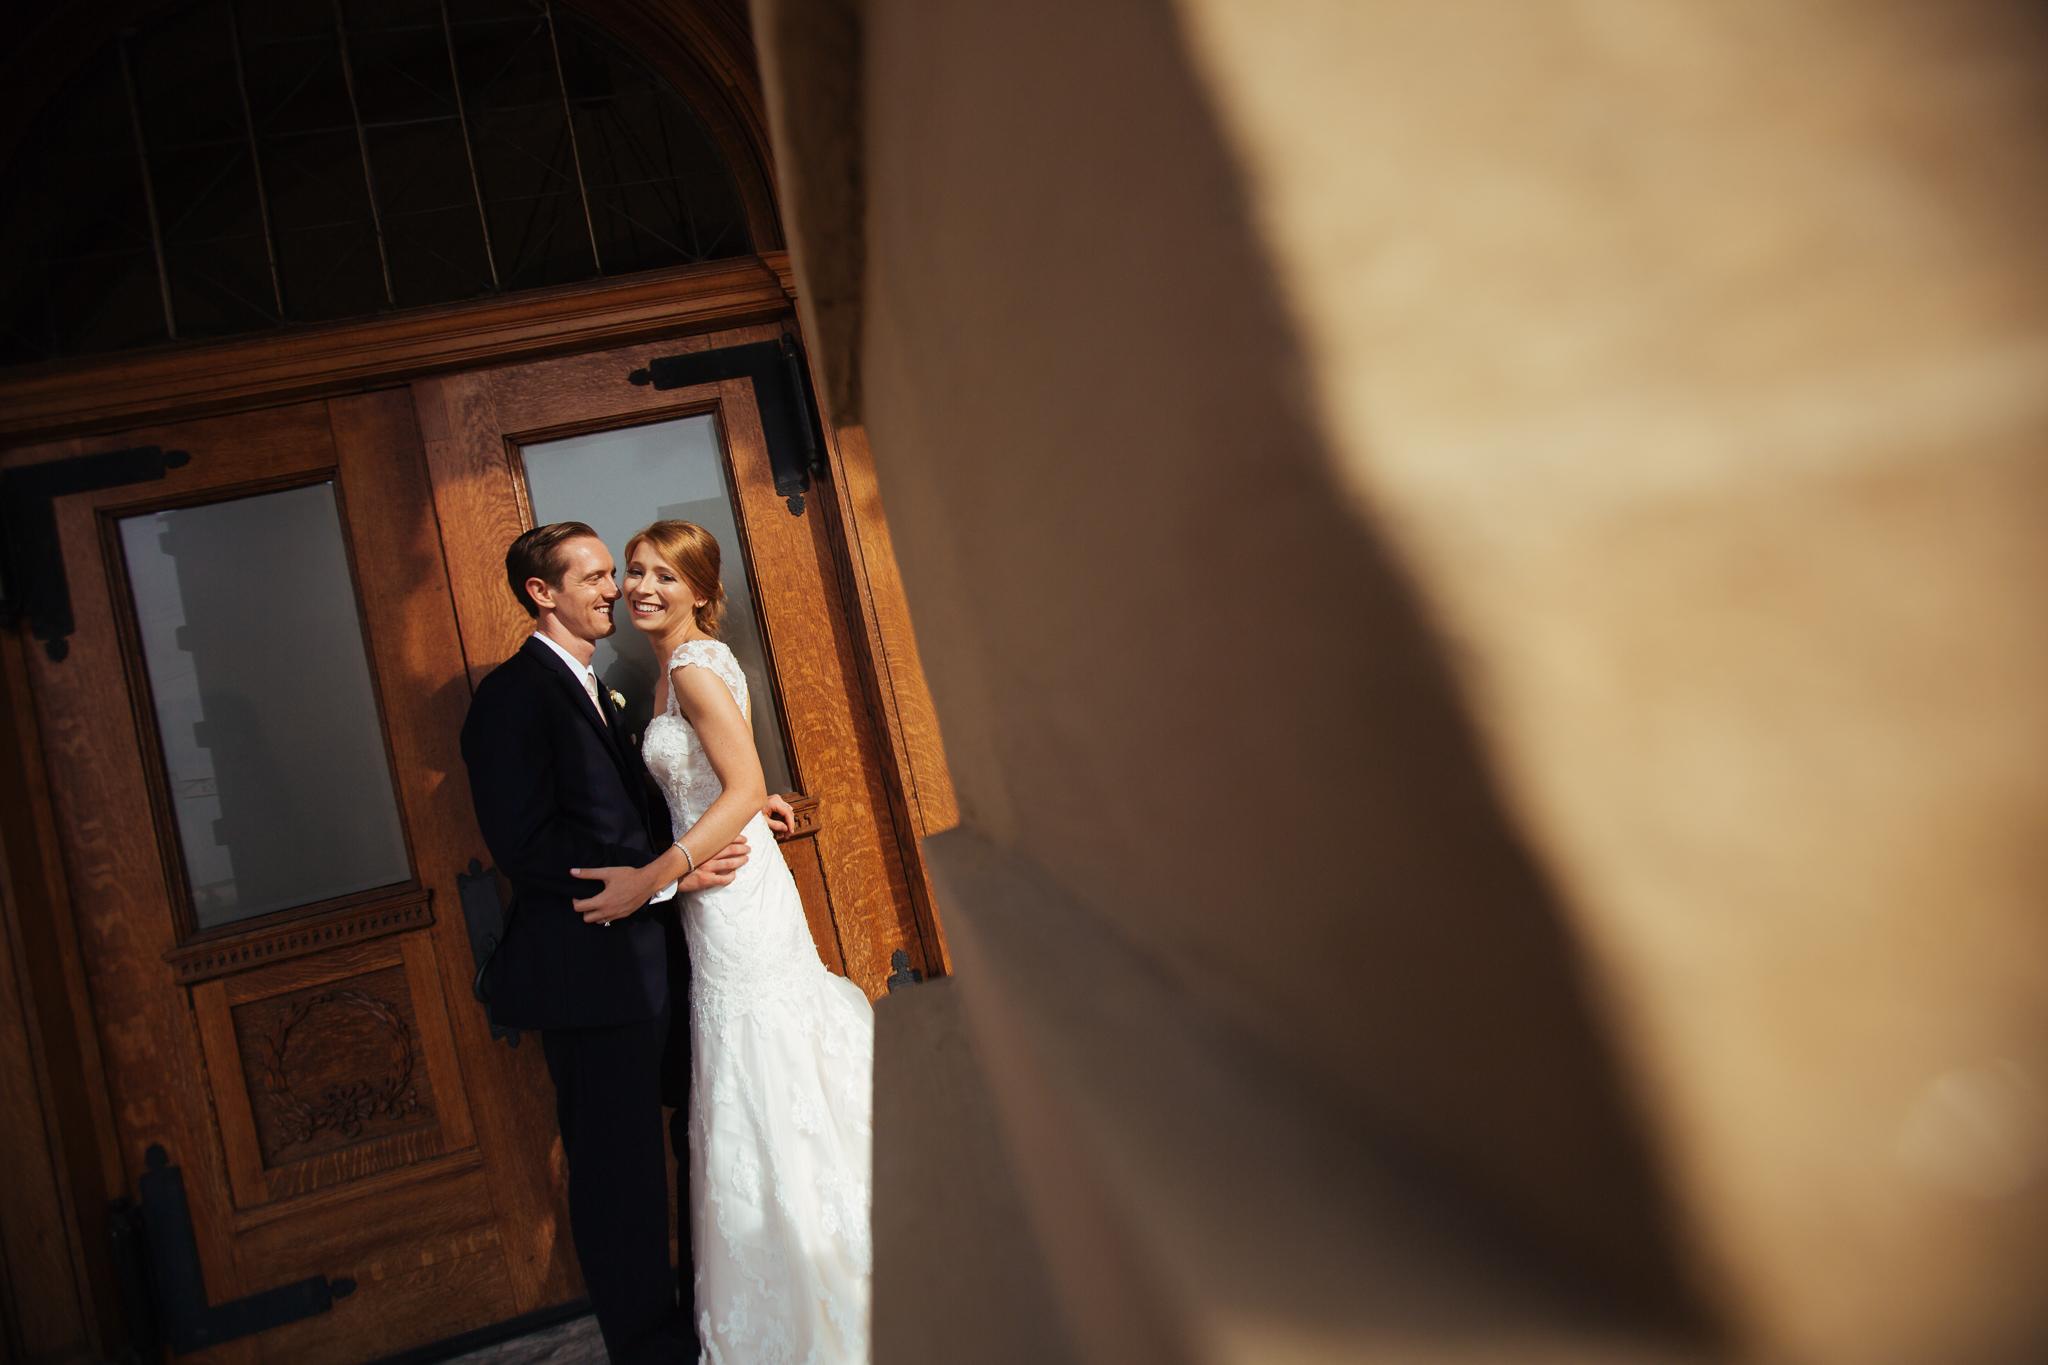 Michael and Kelly - the ashton depot - wedding DFW - wedding photographer- elizalde photography (78 of 150).jpg